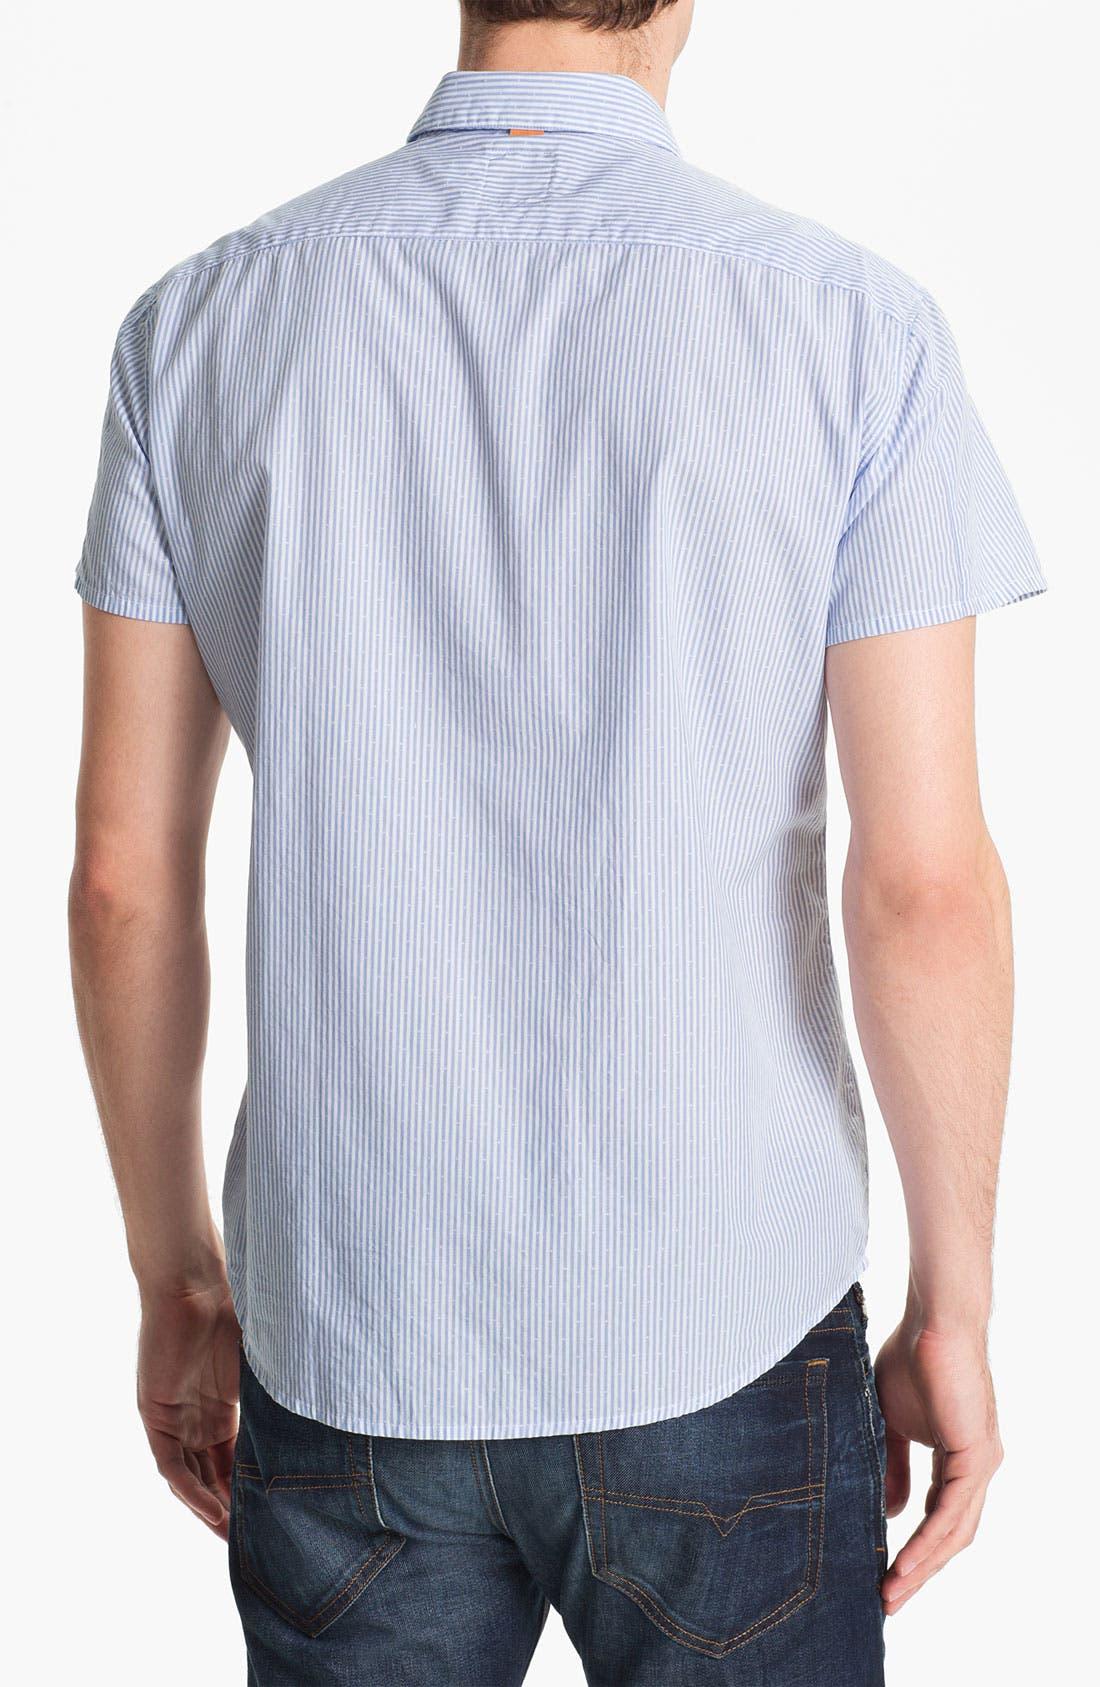 Alternate Image 2  - BOSS Orange 'Casoe' Stripe Woven Shirt